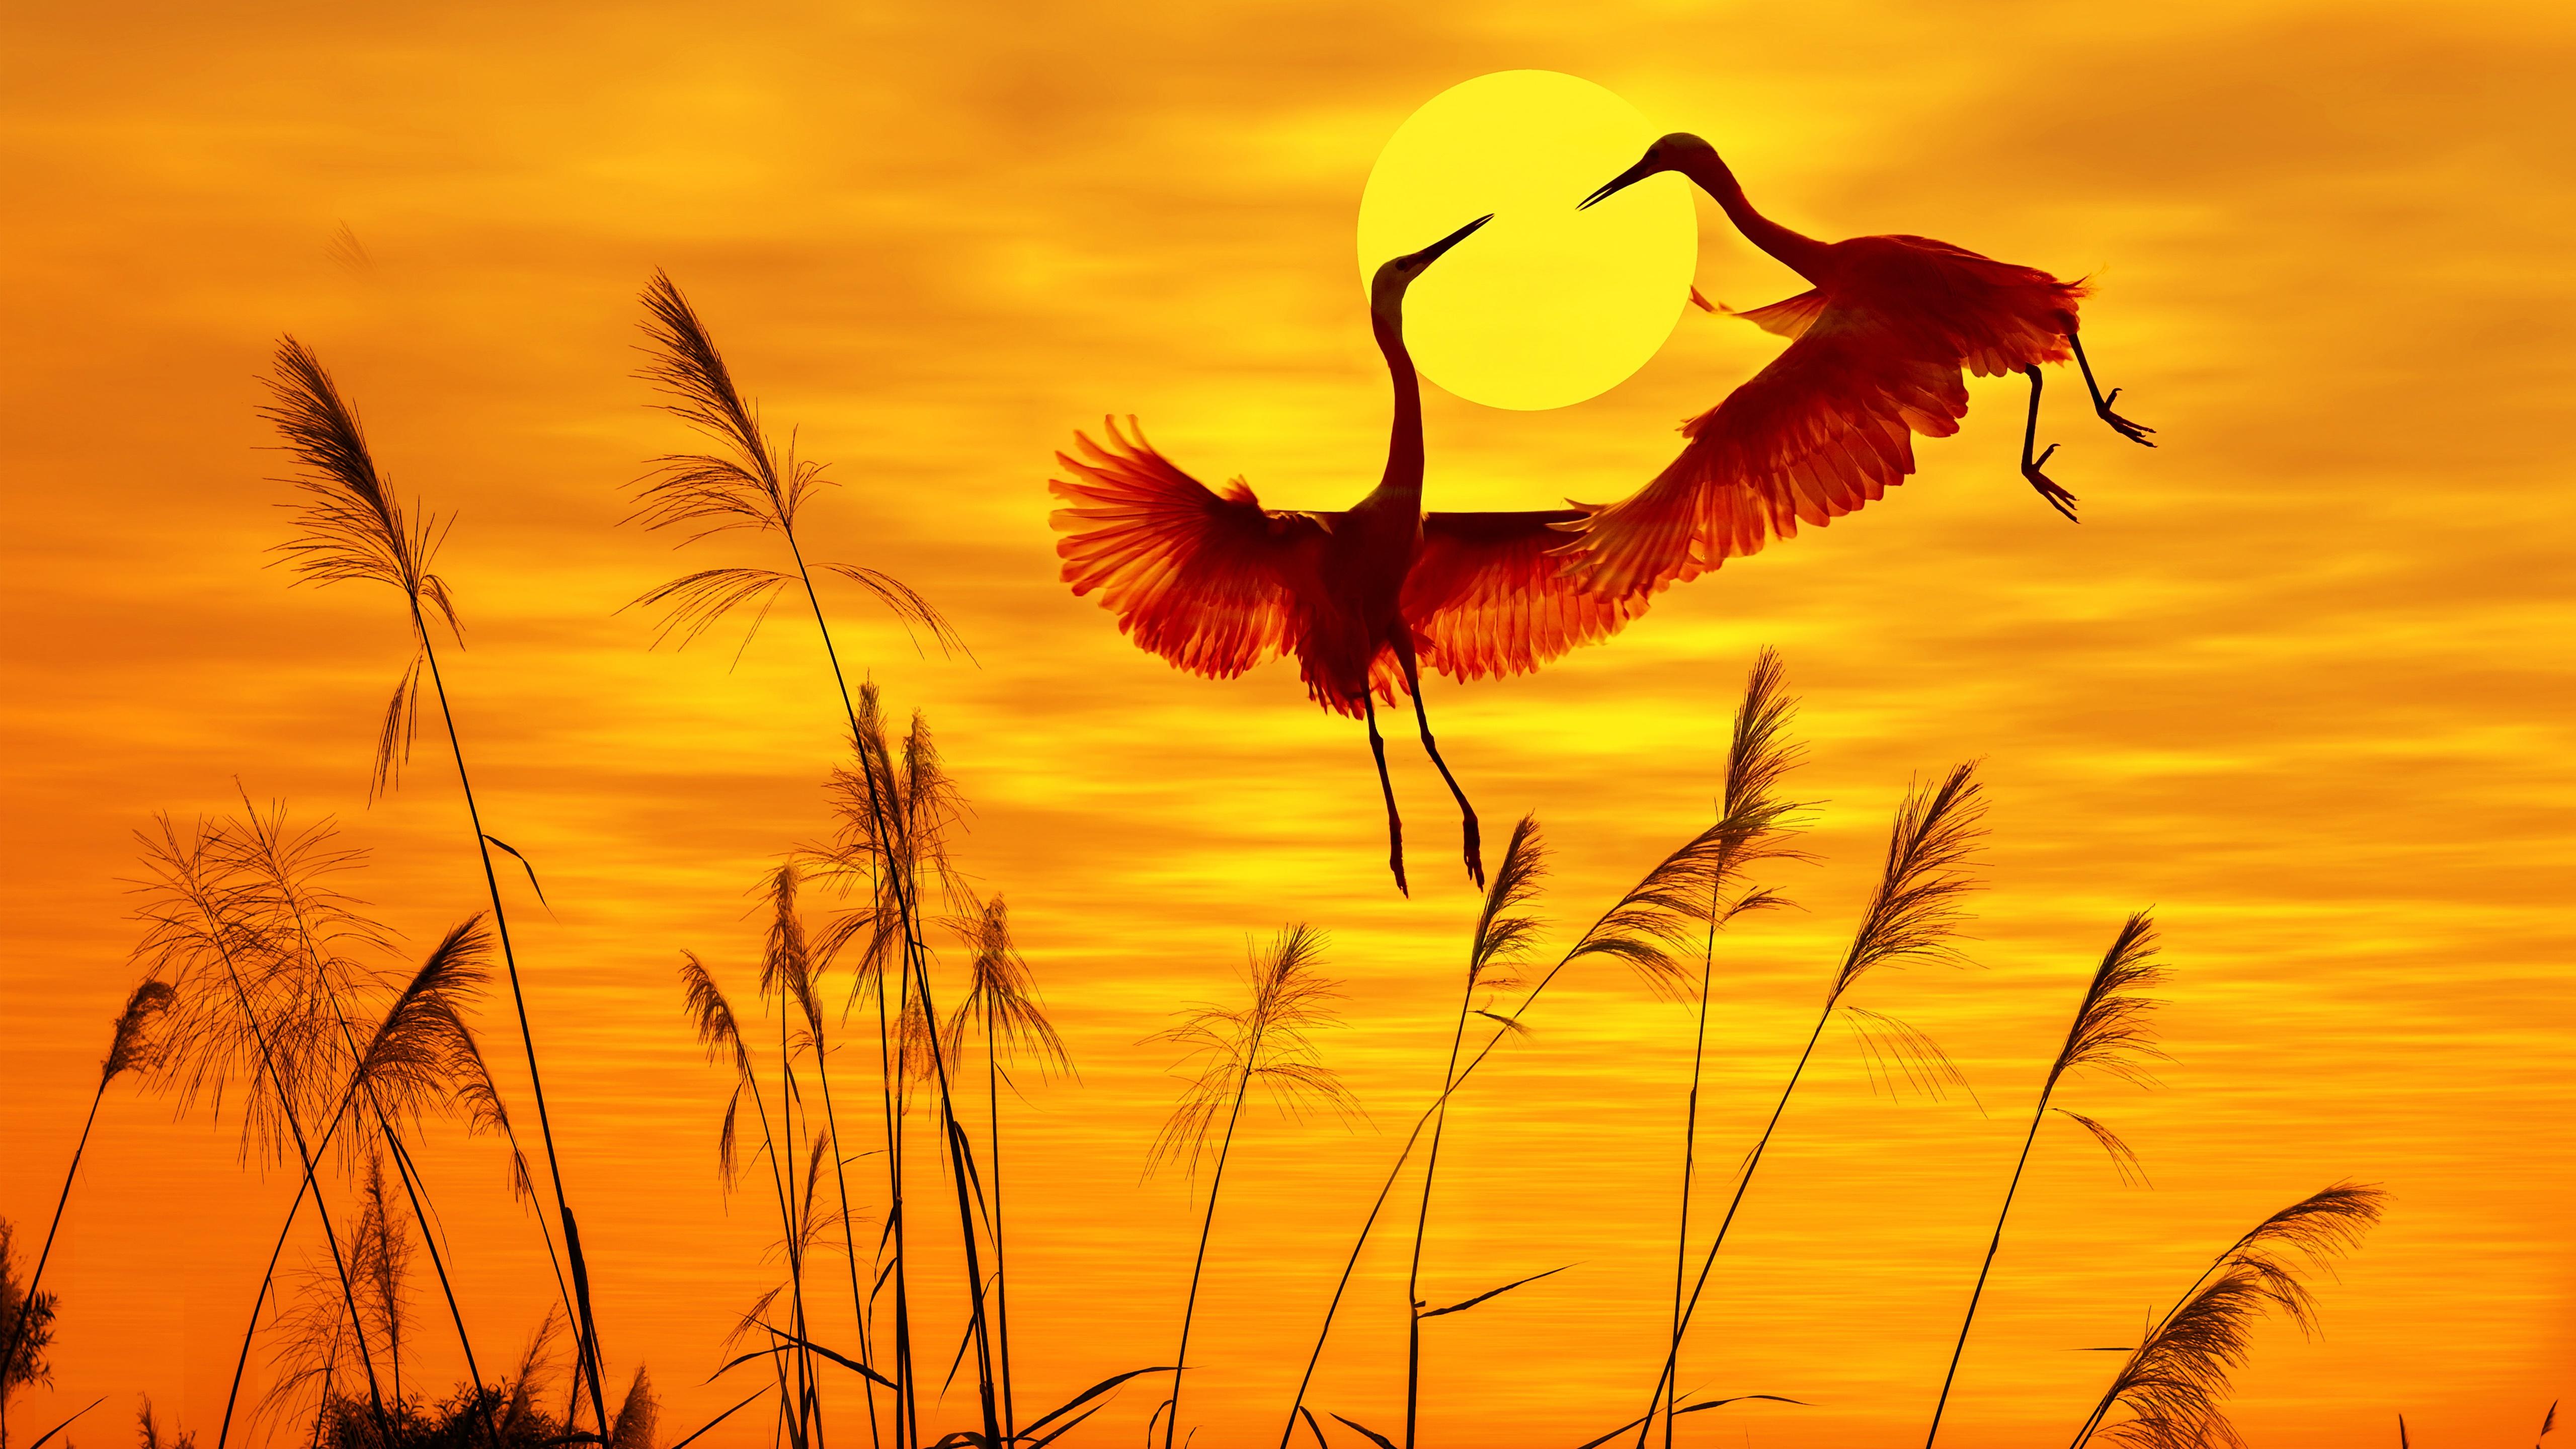 Birds in sunrise wallpaper